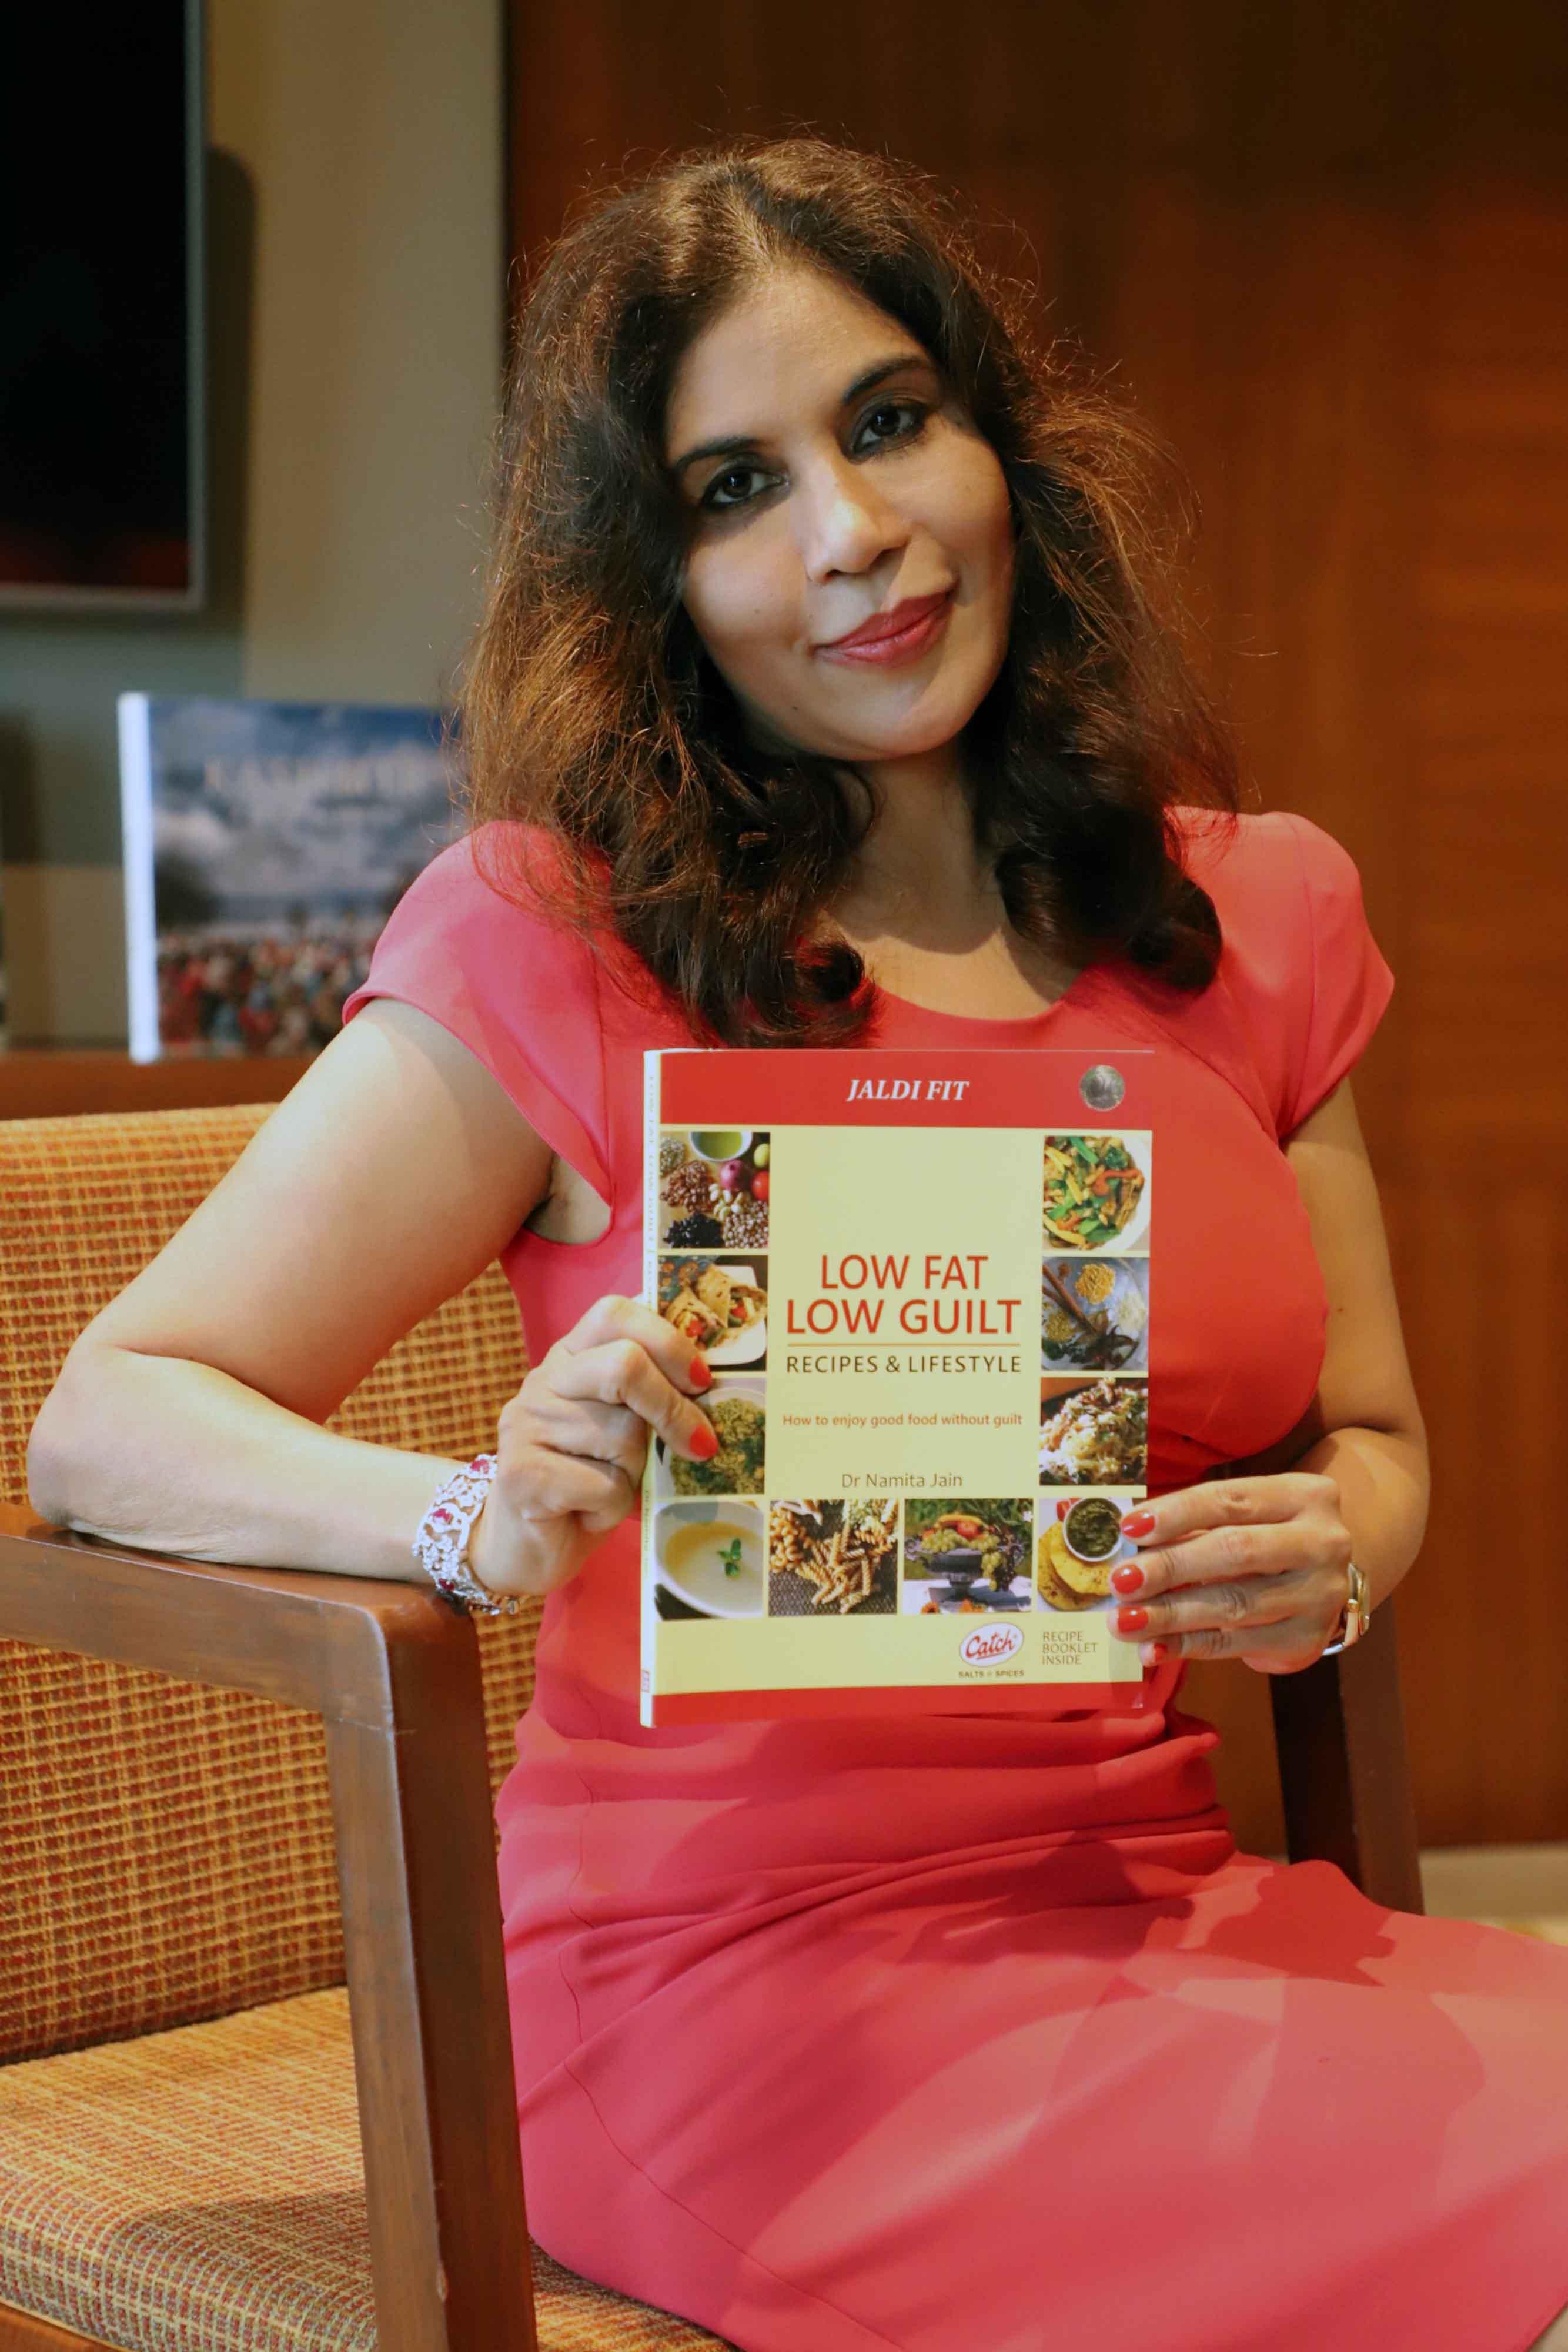 Wellness Expert Namita Jain